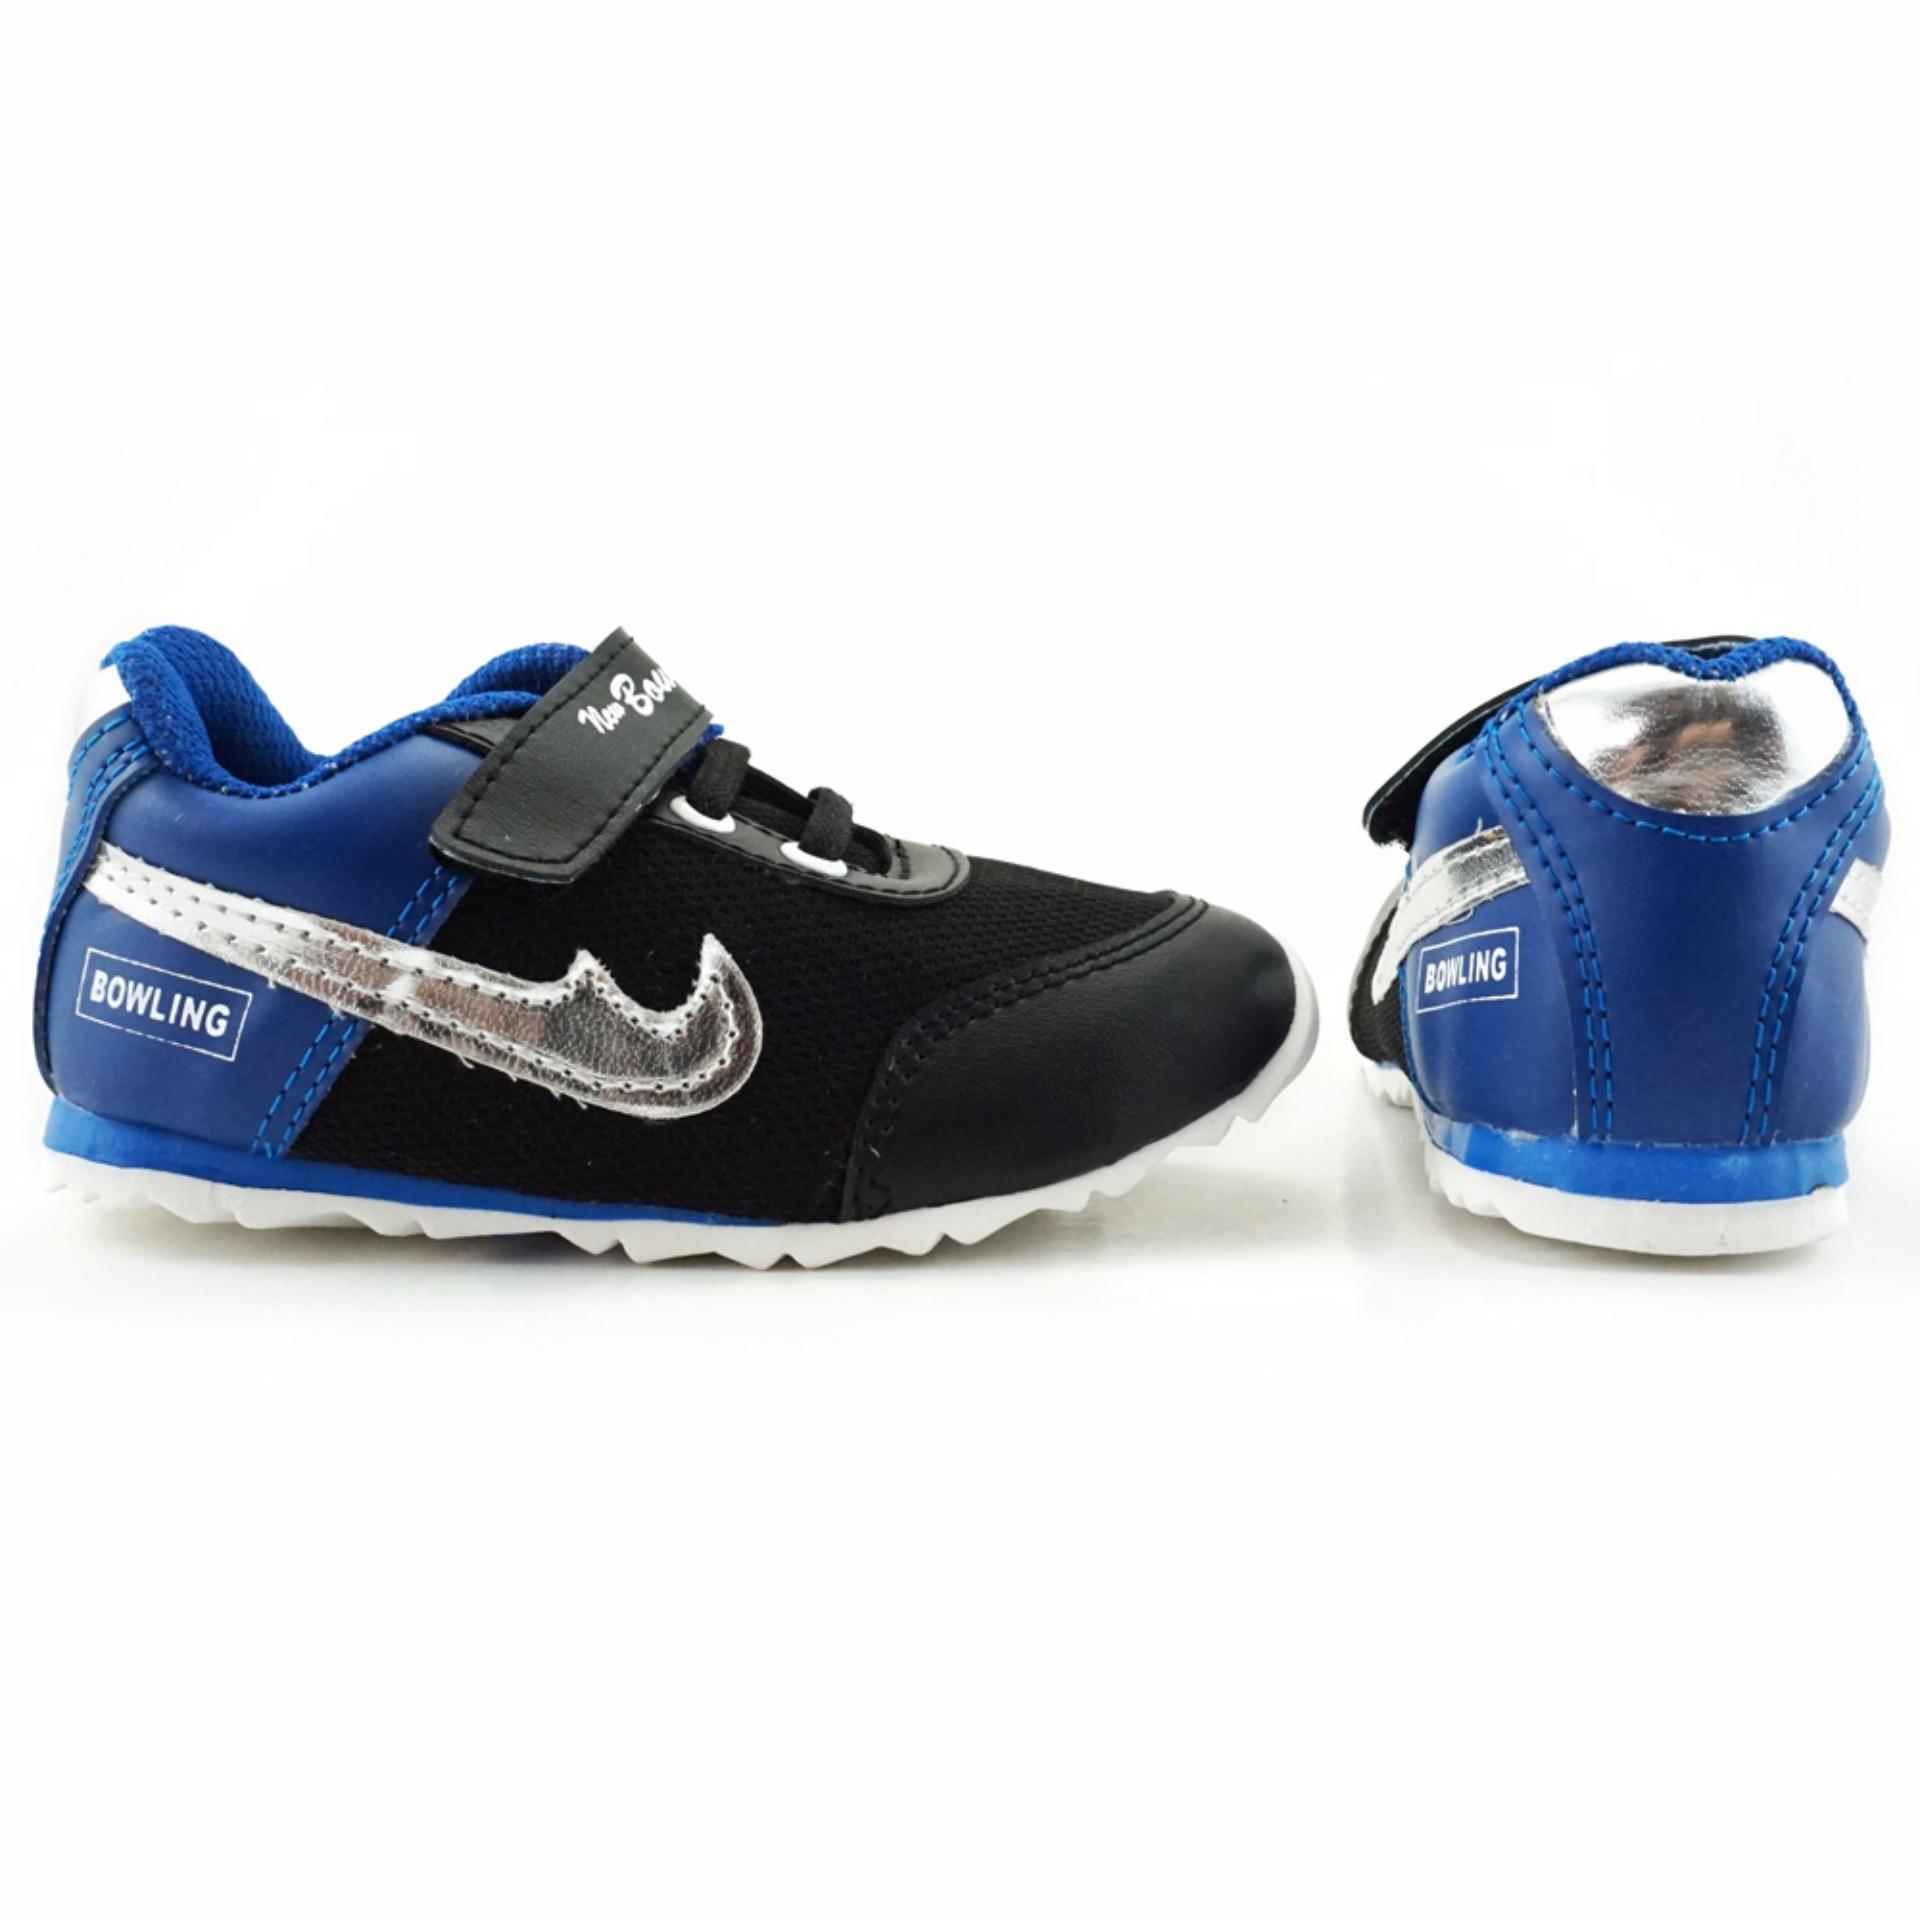 Trendishoes Sepatu Anak Sporty New Bowling Merah Daftar Harga Bayi Laki Baby Shoes Prewalker Tamagoo Alex Series  0 3 Bulan Abu Muda Biru